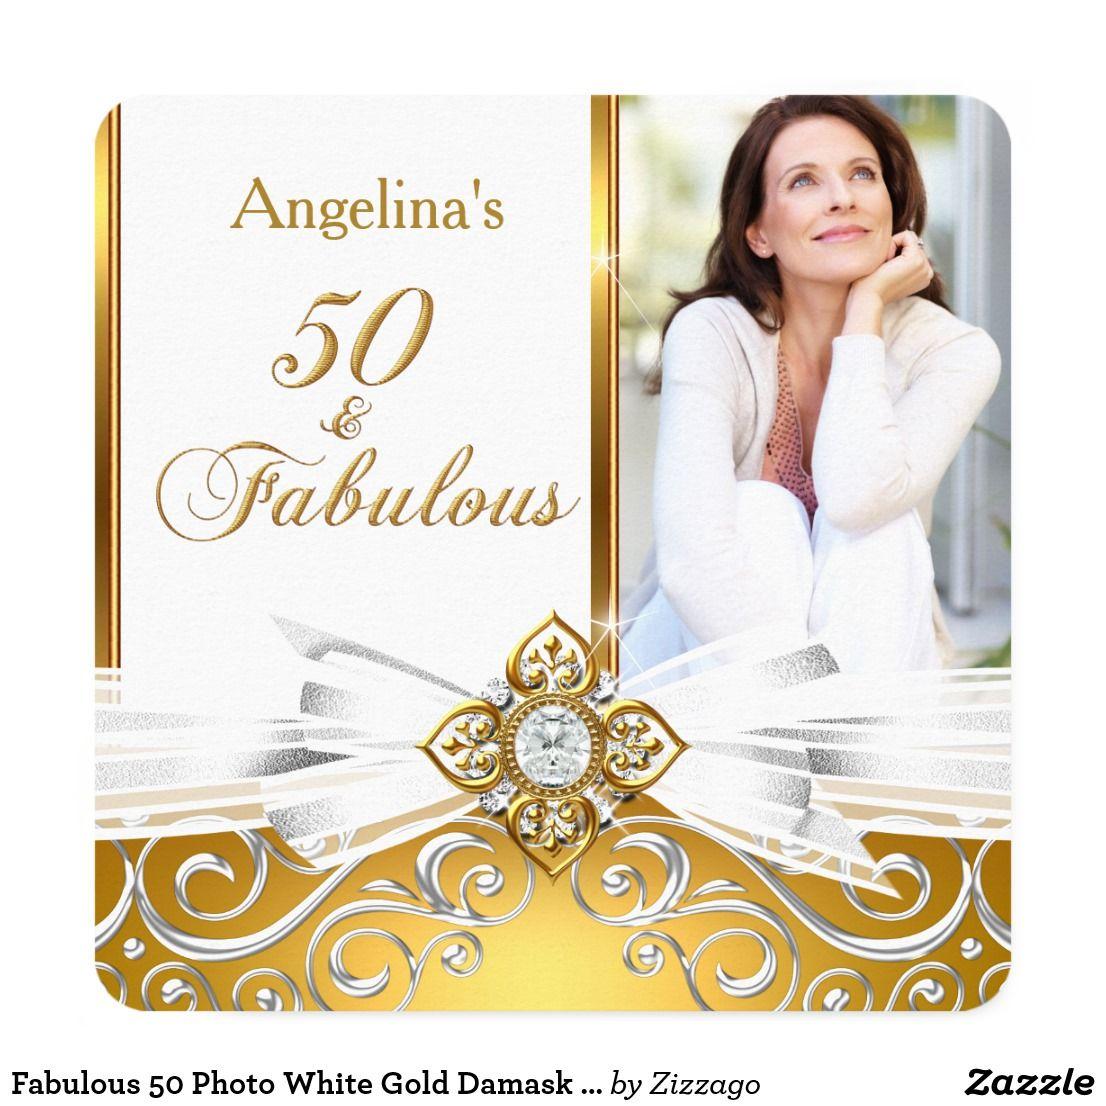 Fabulous 50 Photo White Gold Damask Birthday Party Invitation ...